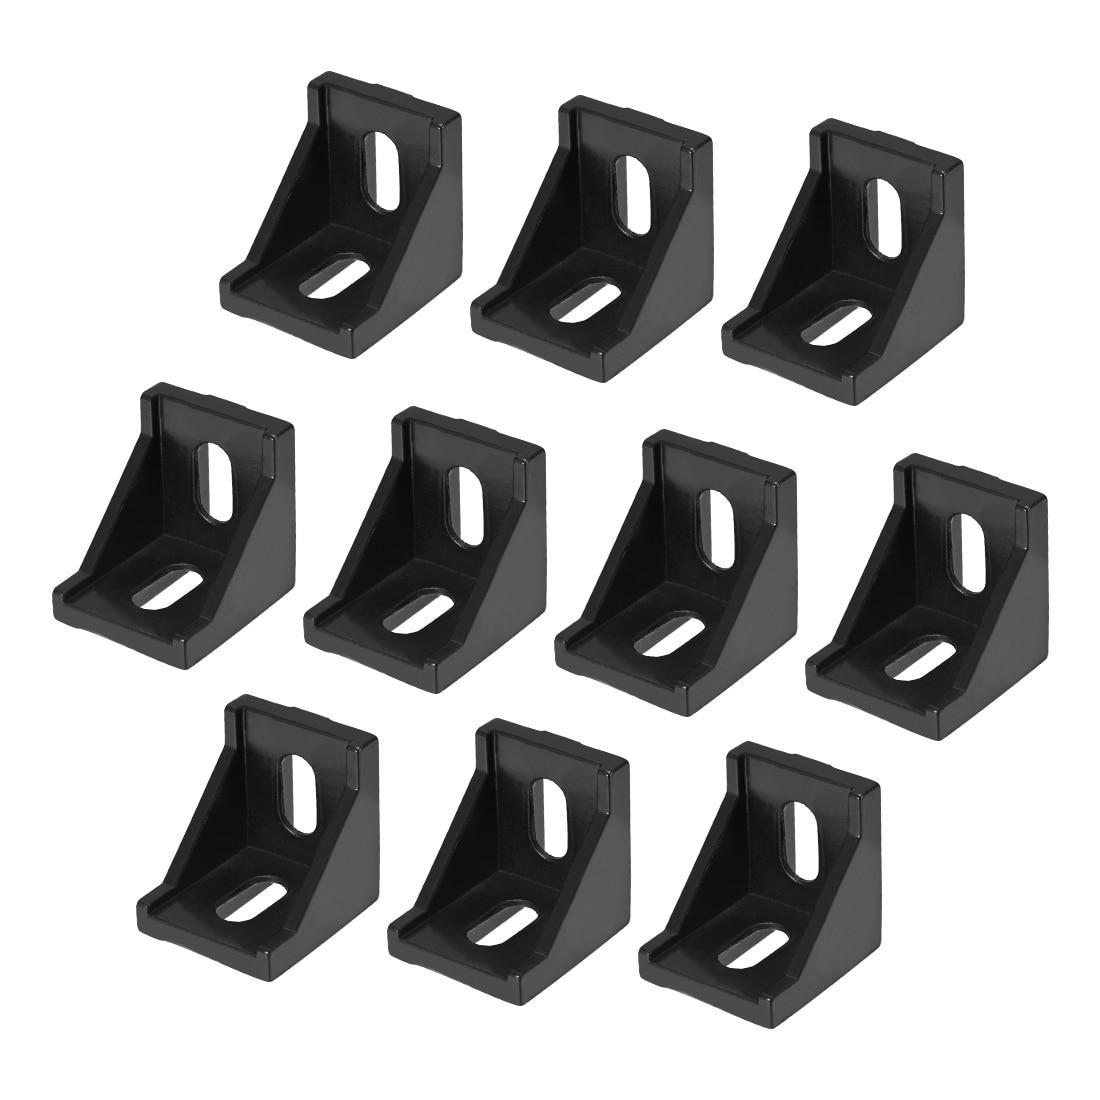 Uxcell Corner Bracket For 4040 Series Aluminum Extrusion Profile, 10 Pcs (Black)